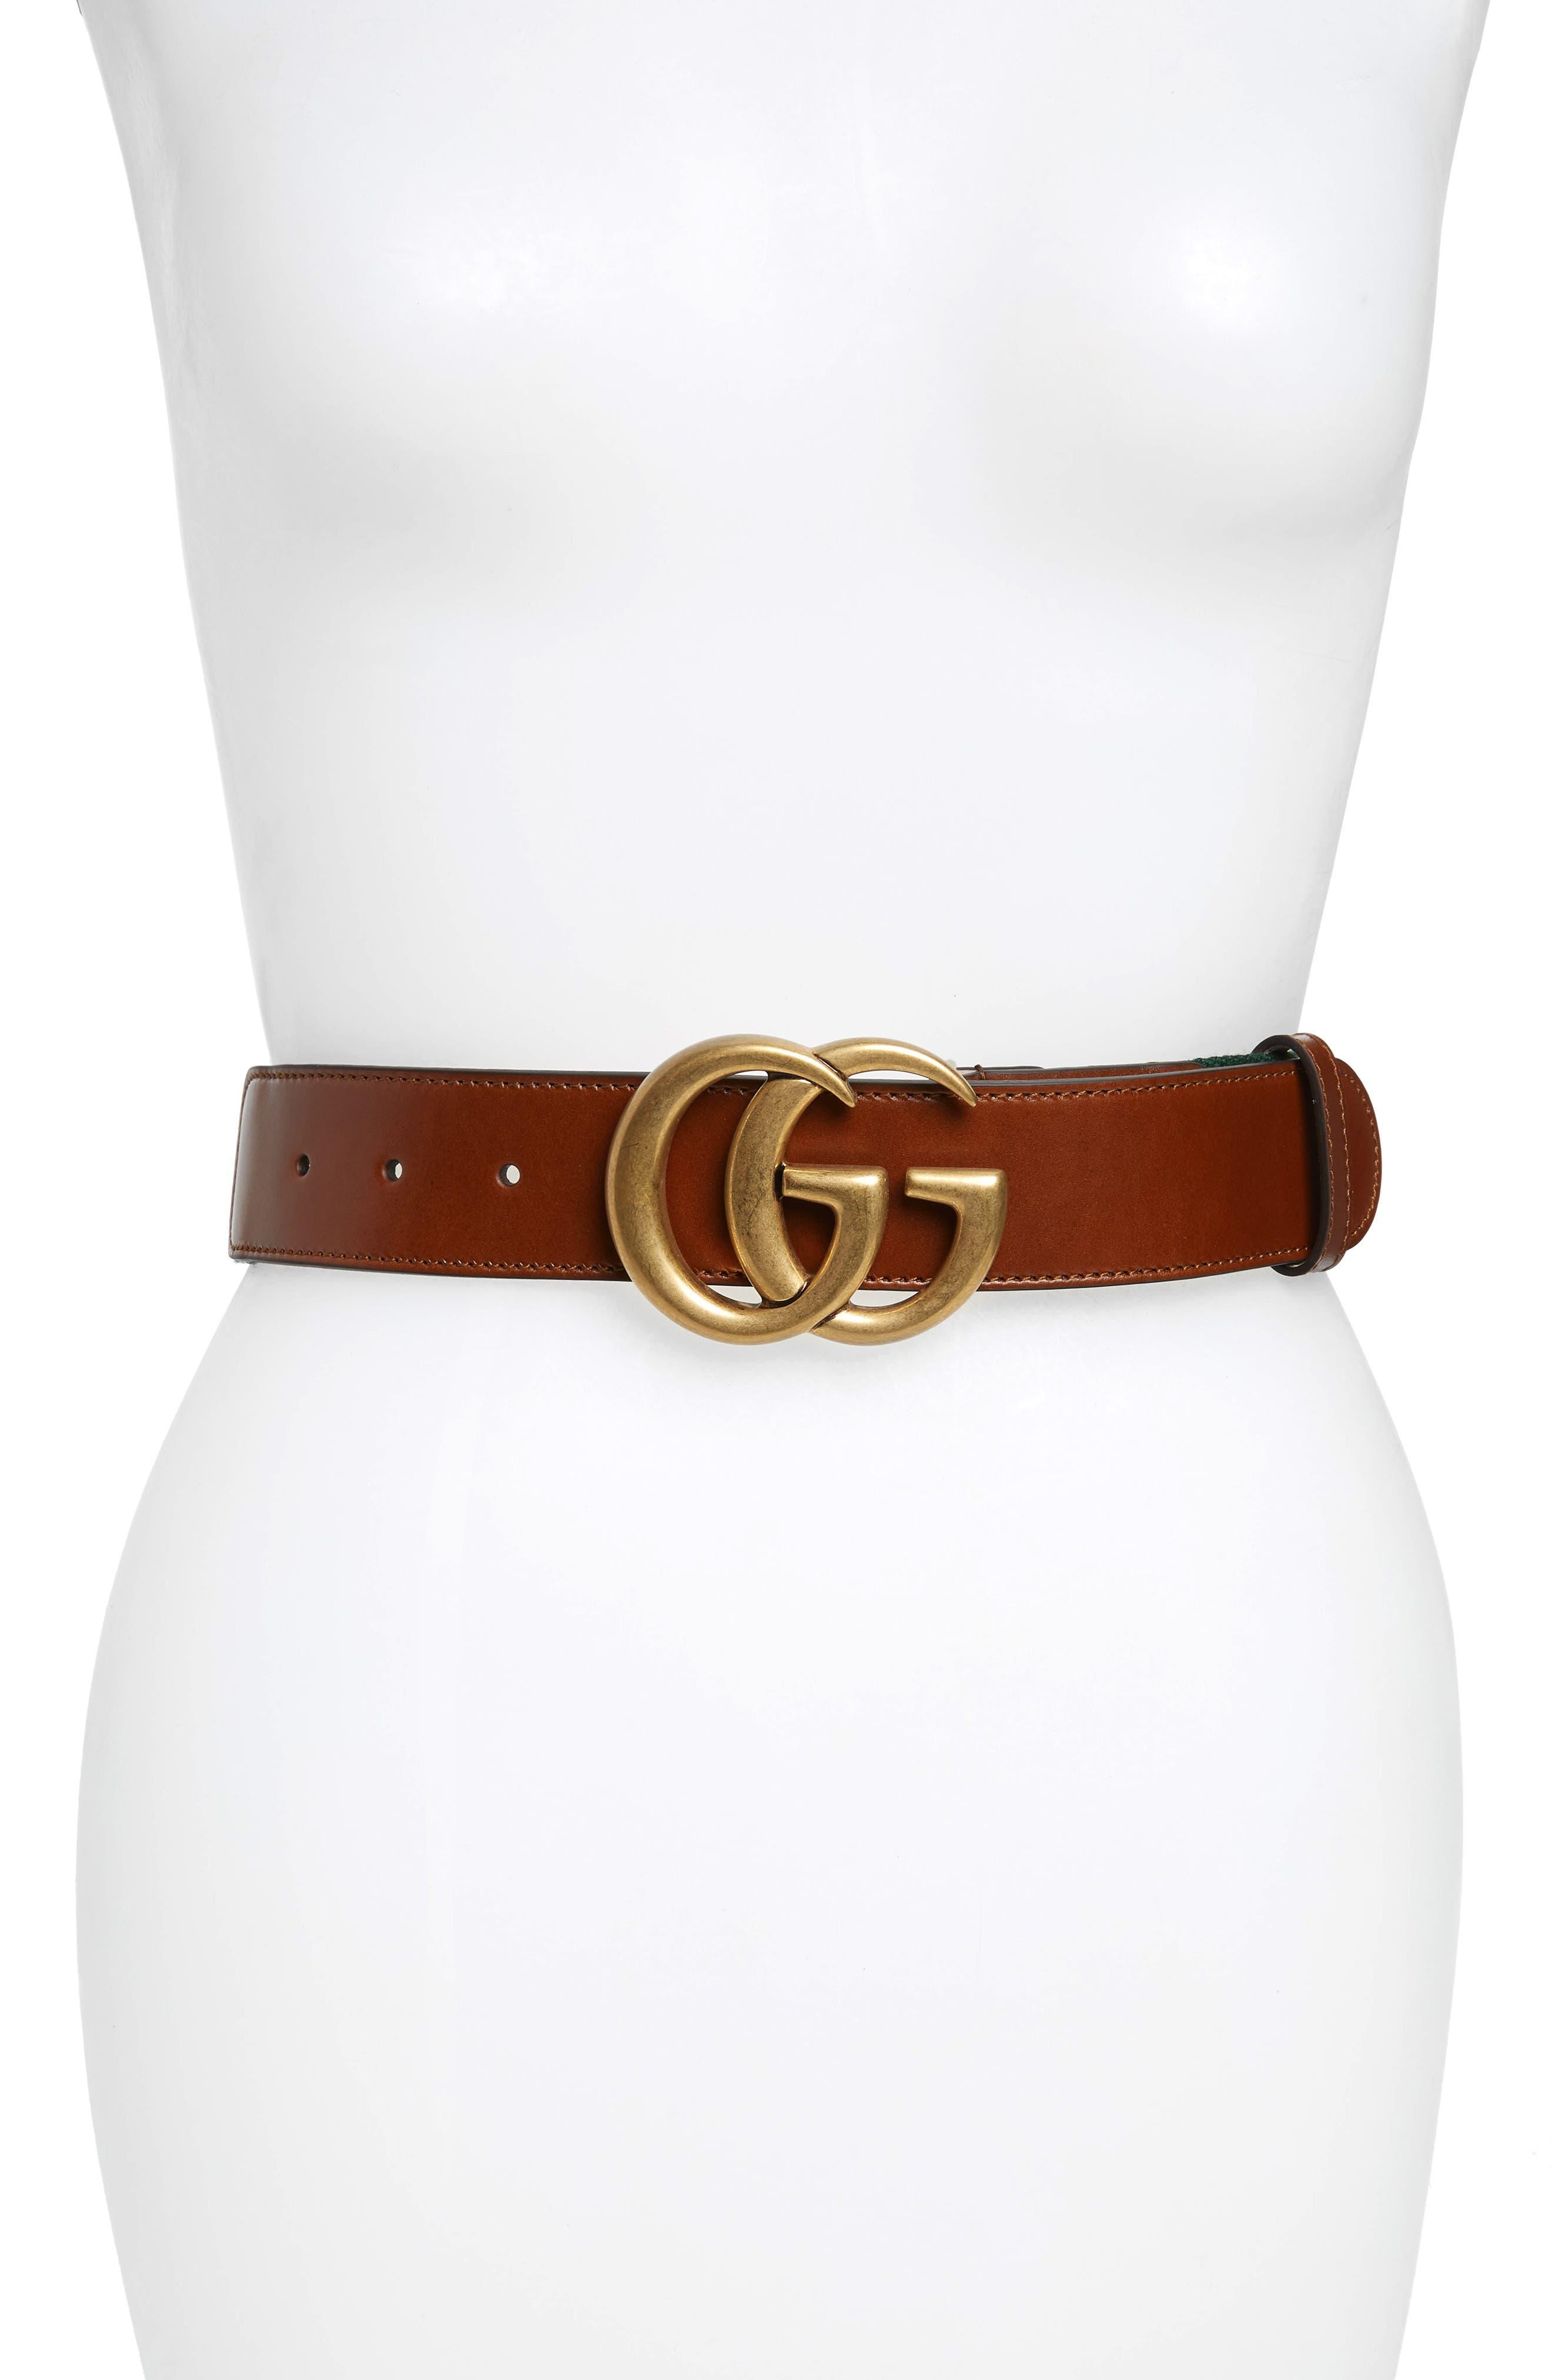 GG Logo Leather Belt,                             Main thumbnail 1, color,                             231